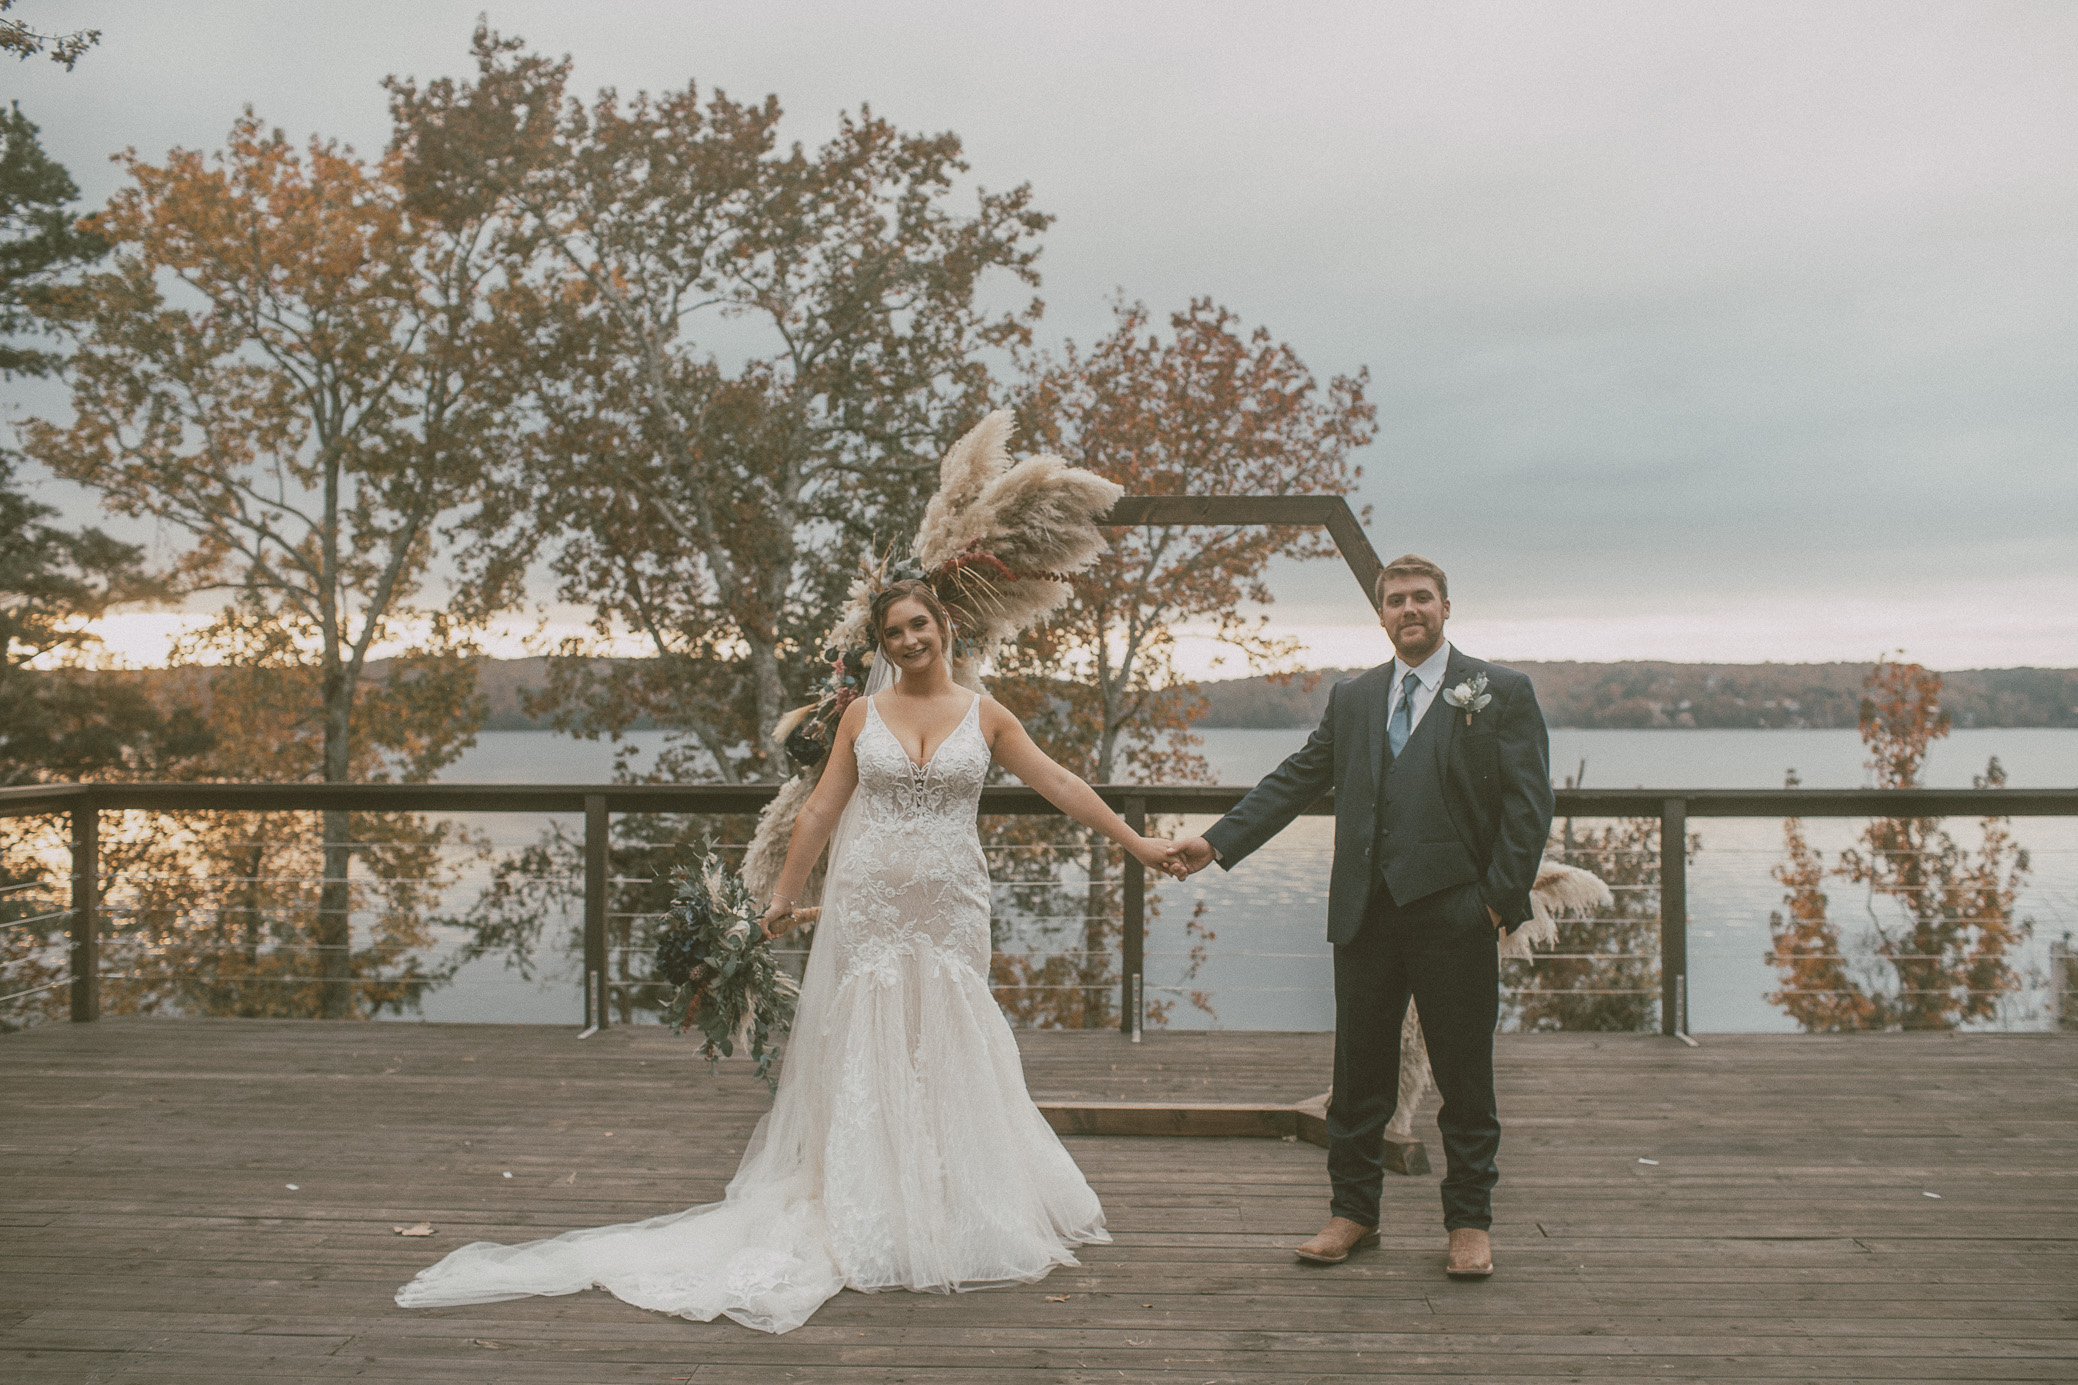 Alabama Wedding Photography at The Riverton